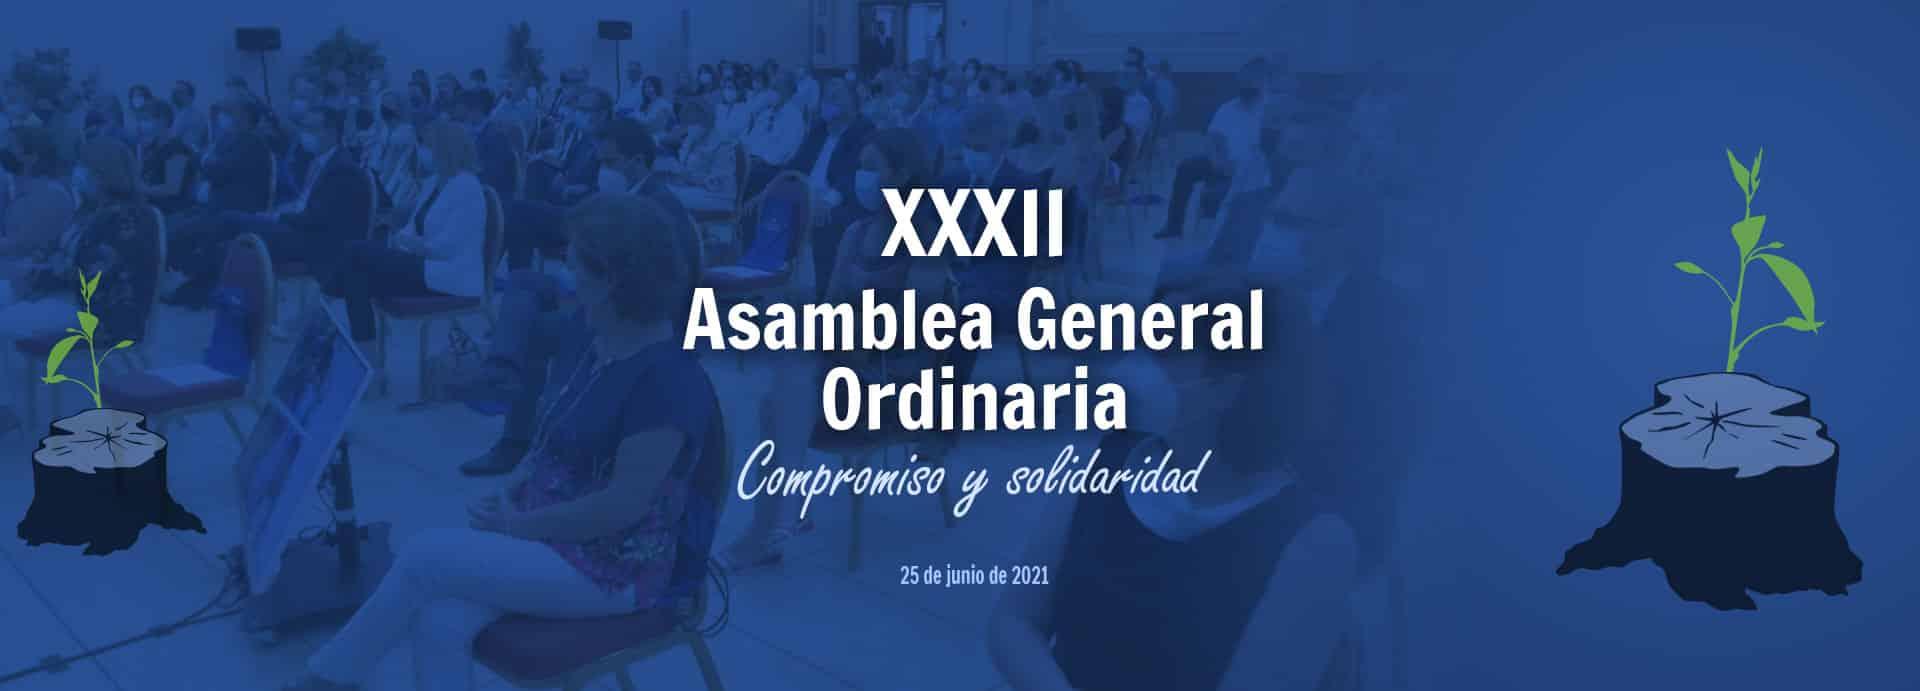 XXXII Asamblea General Ordinaria de Ucomur 2021